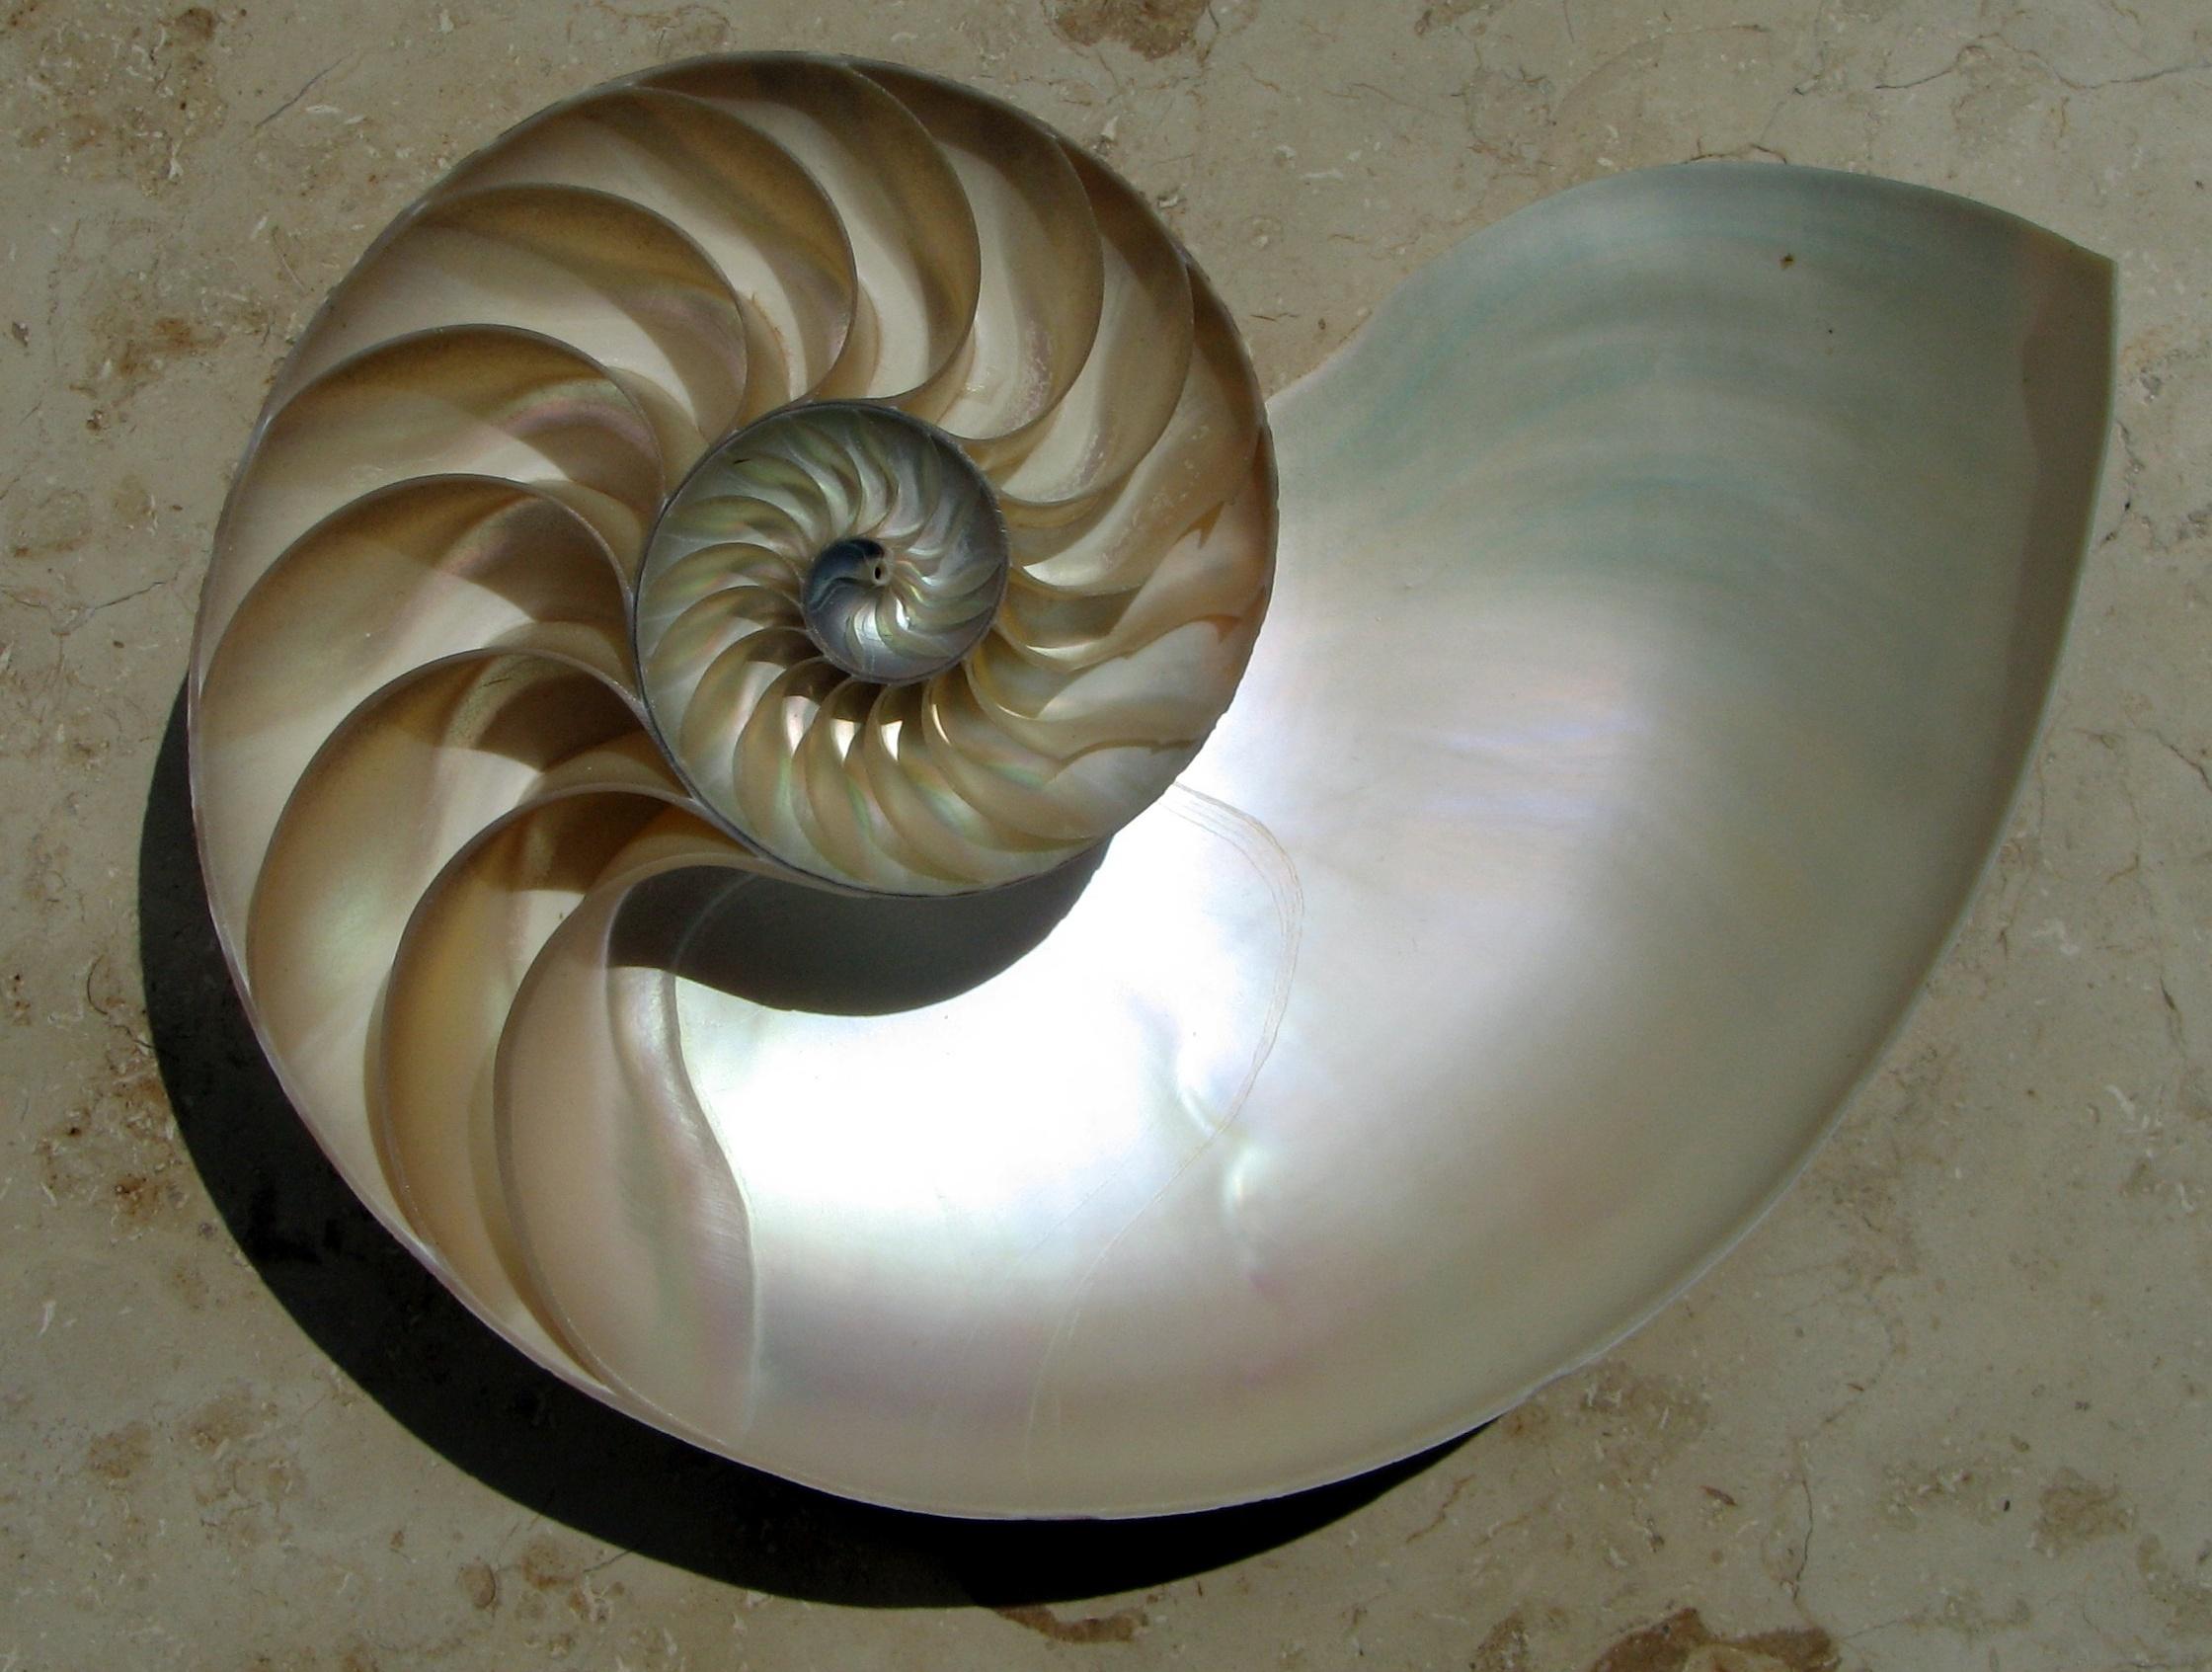 NautilusCutawayLogarithmicSpiral